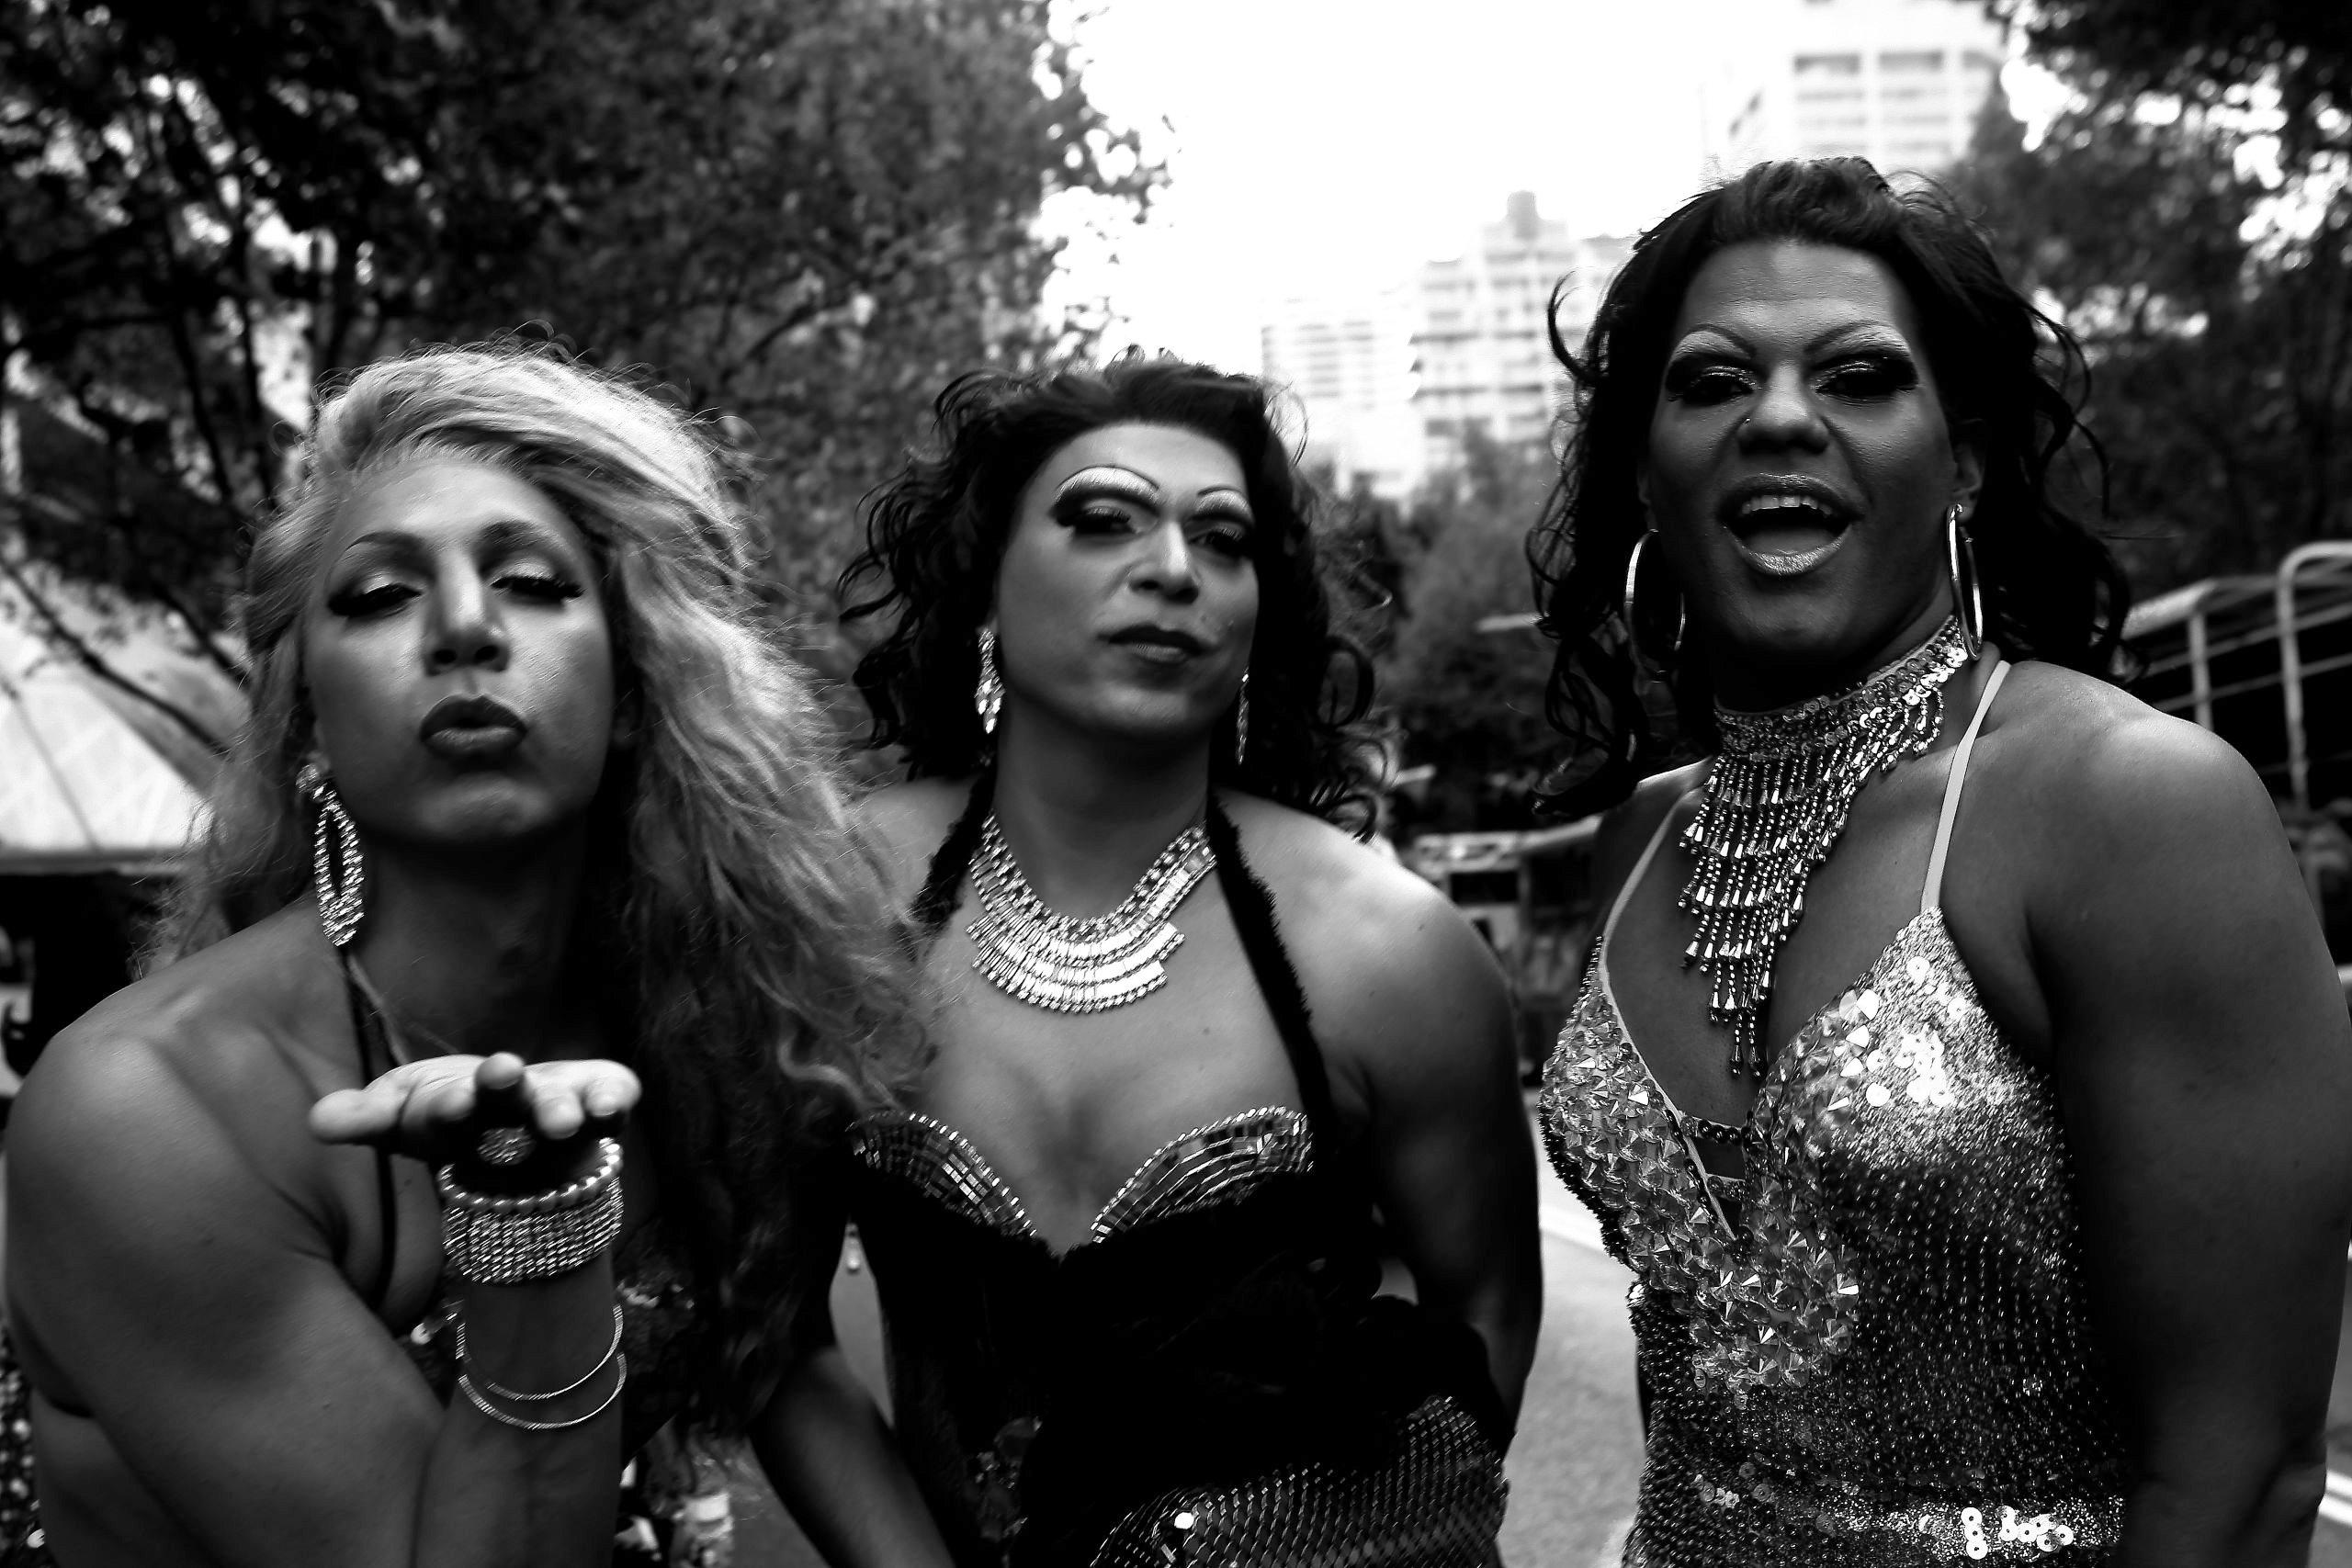 Barbara McGrady, Sister Girls stylin up, Mardi Gras, 2013